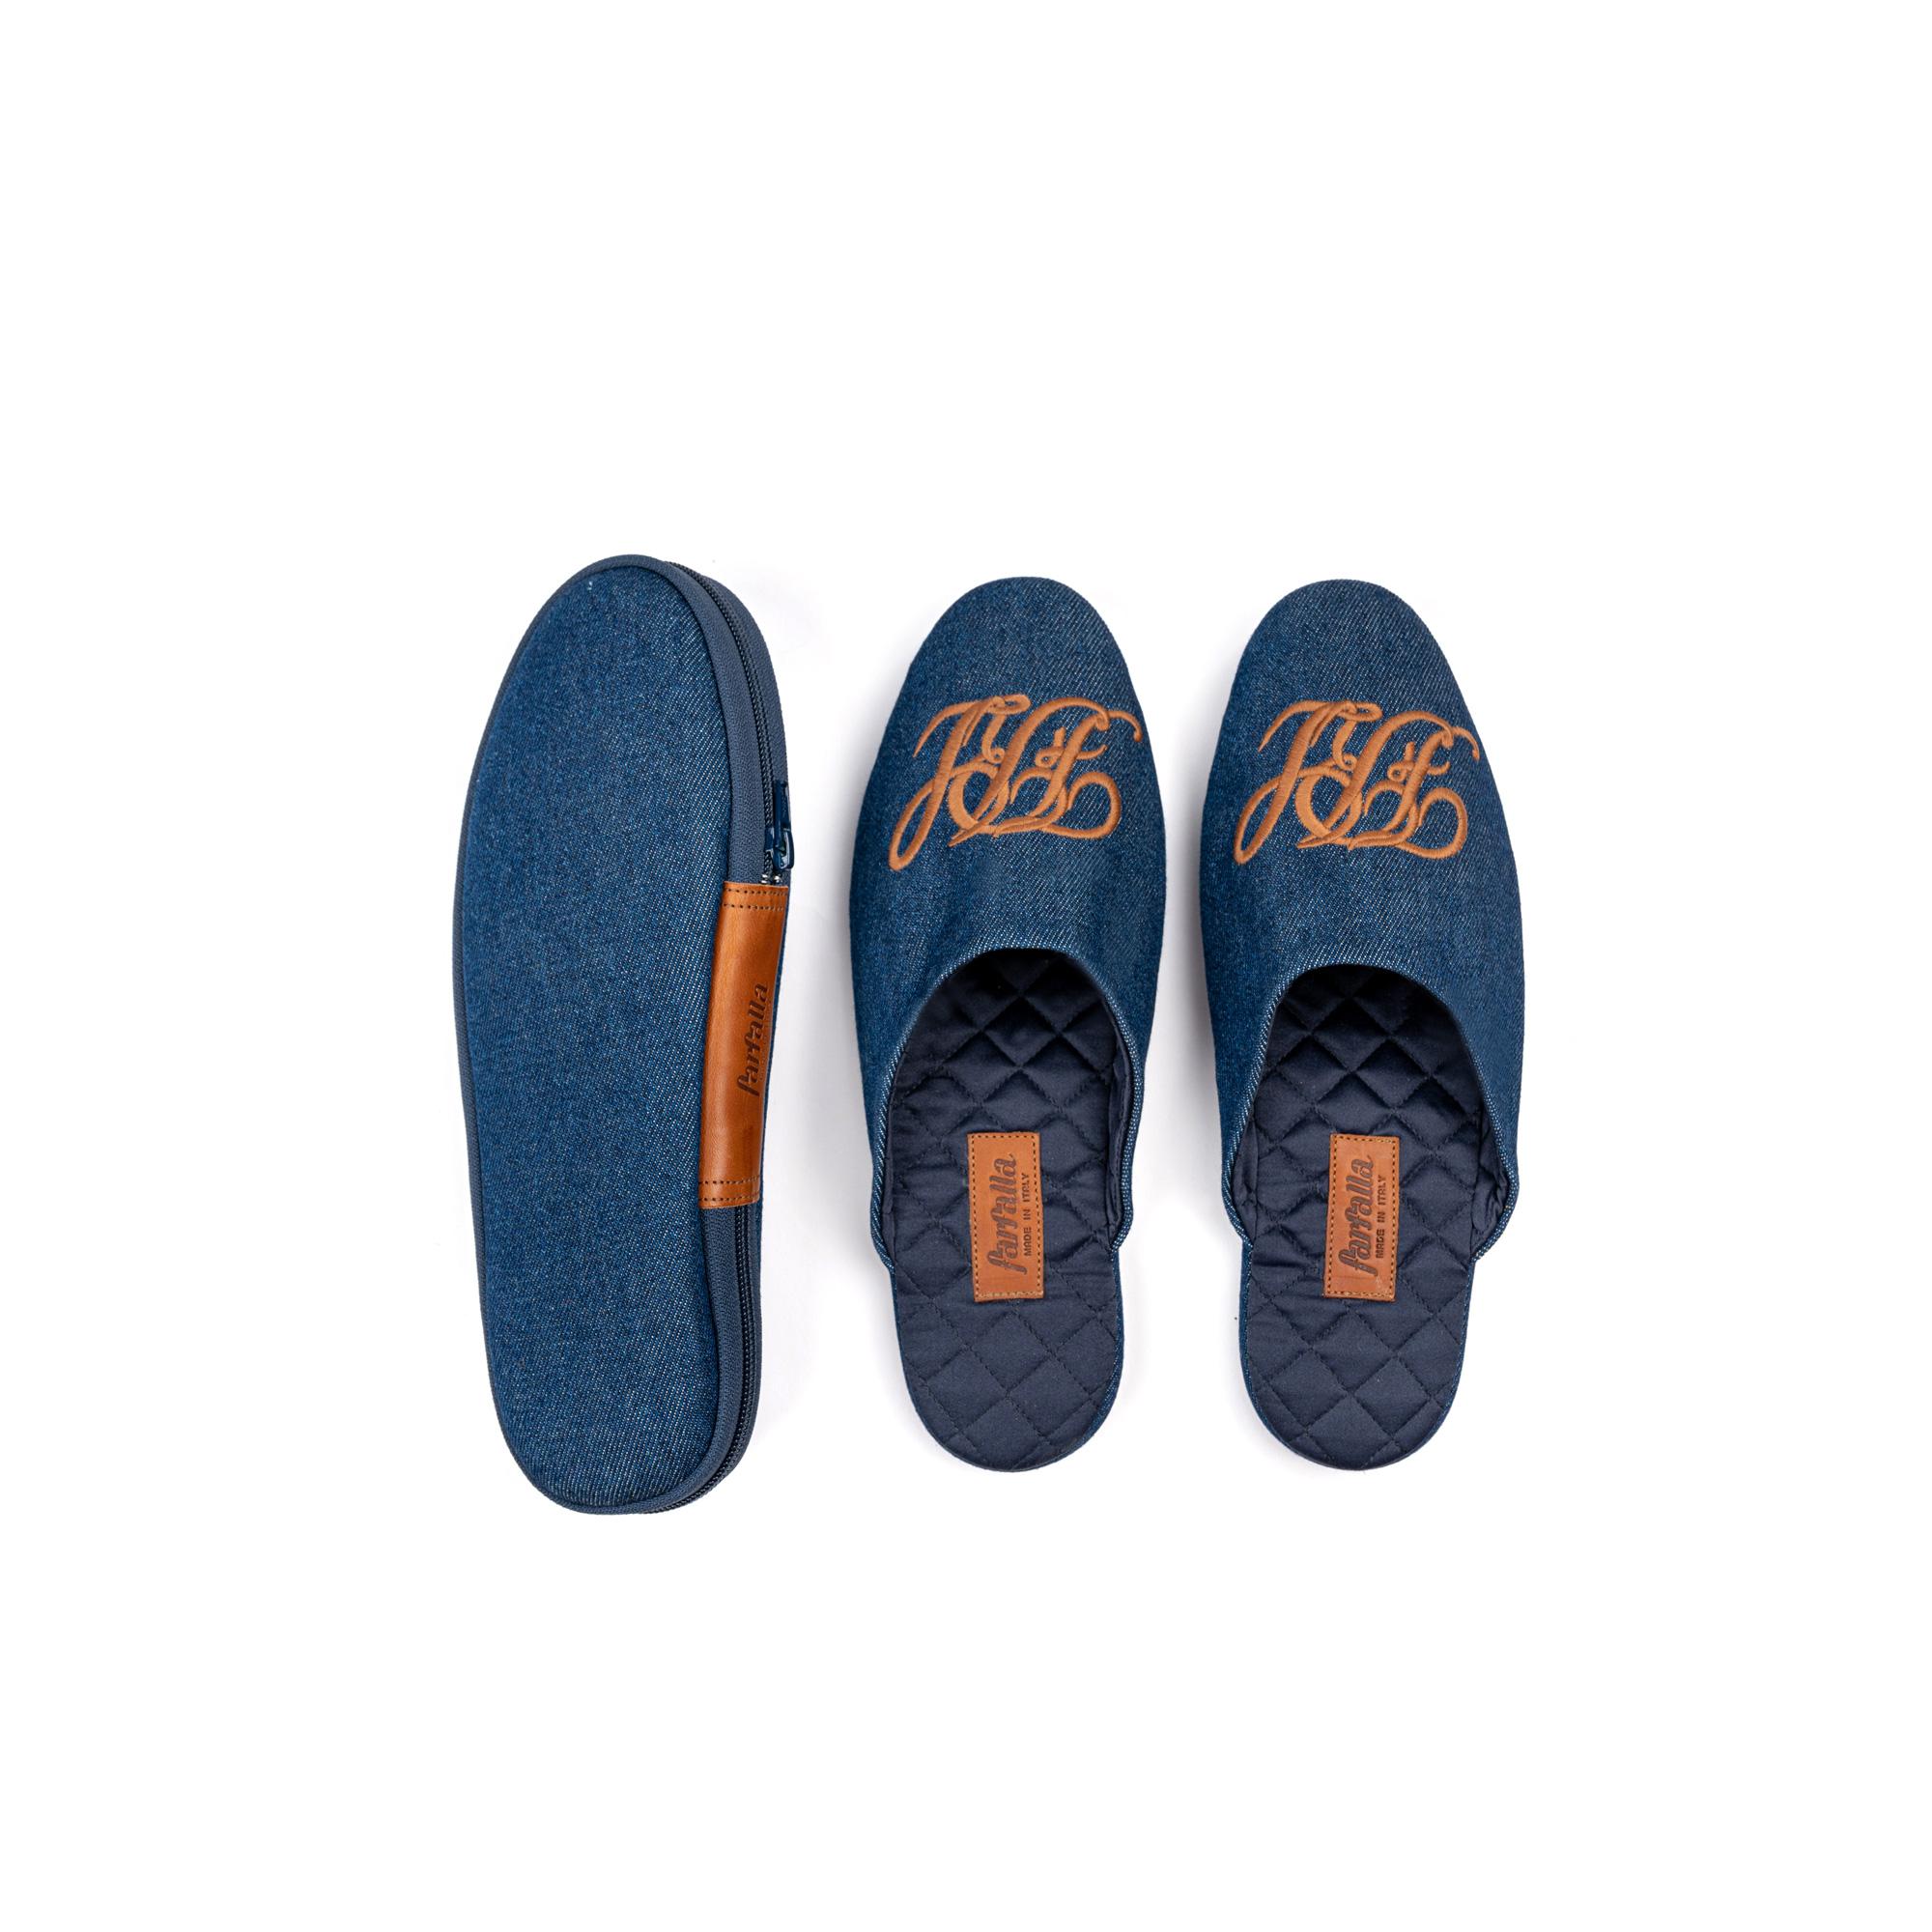 Indoor travelling slipper in denim - Farfalla italian slippers